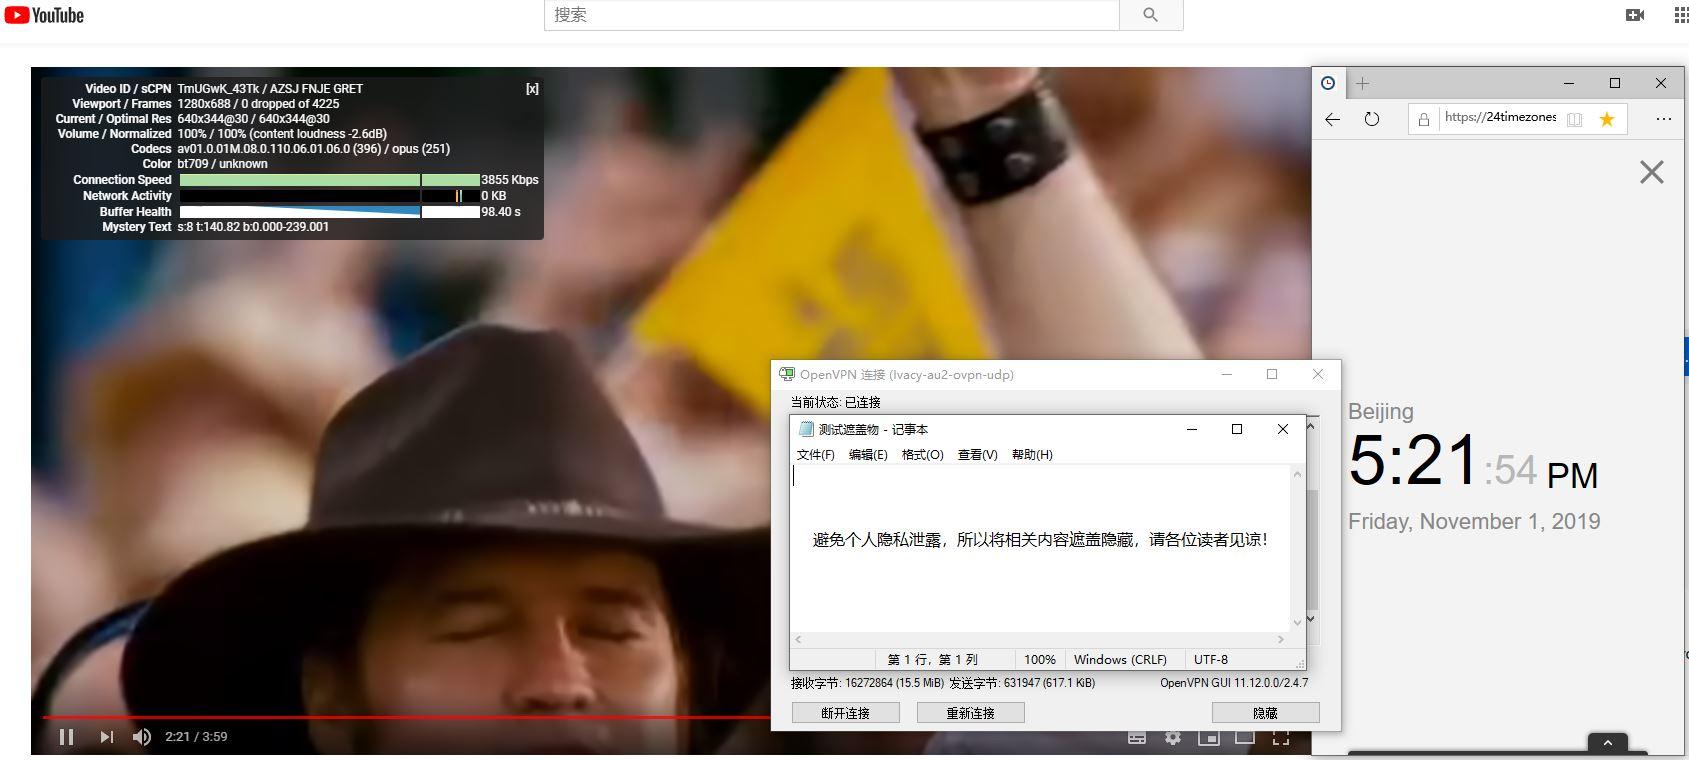 Windows IvacyVPN AU-2 中国VPN翻墙软件 科学上网 Youtube链接速度 - 20191101